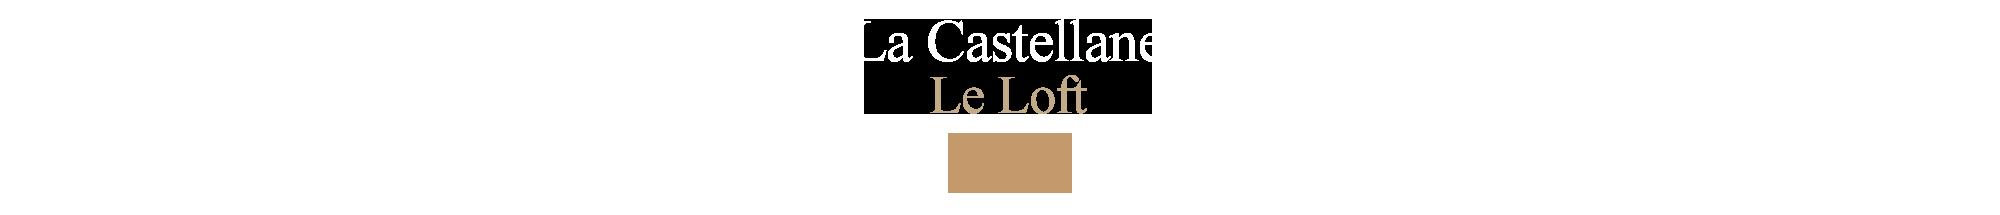 Le-Loft--la-Castellane